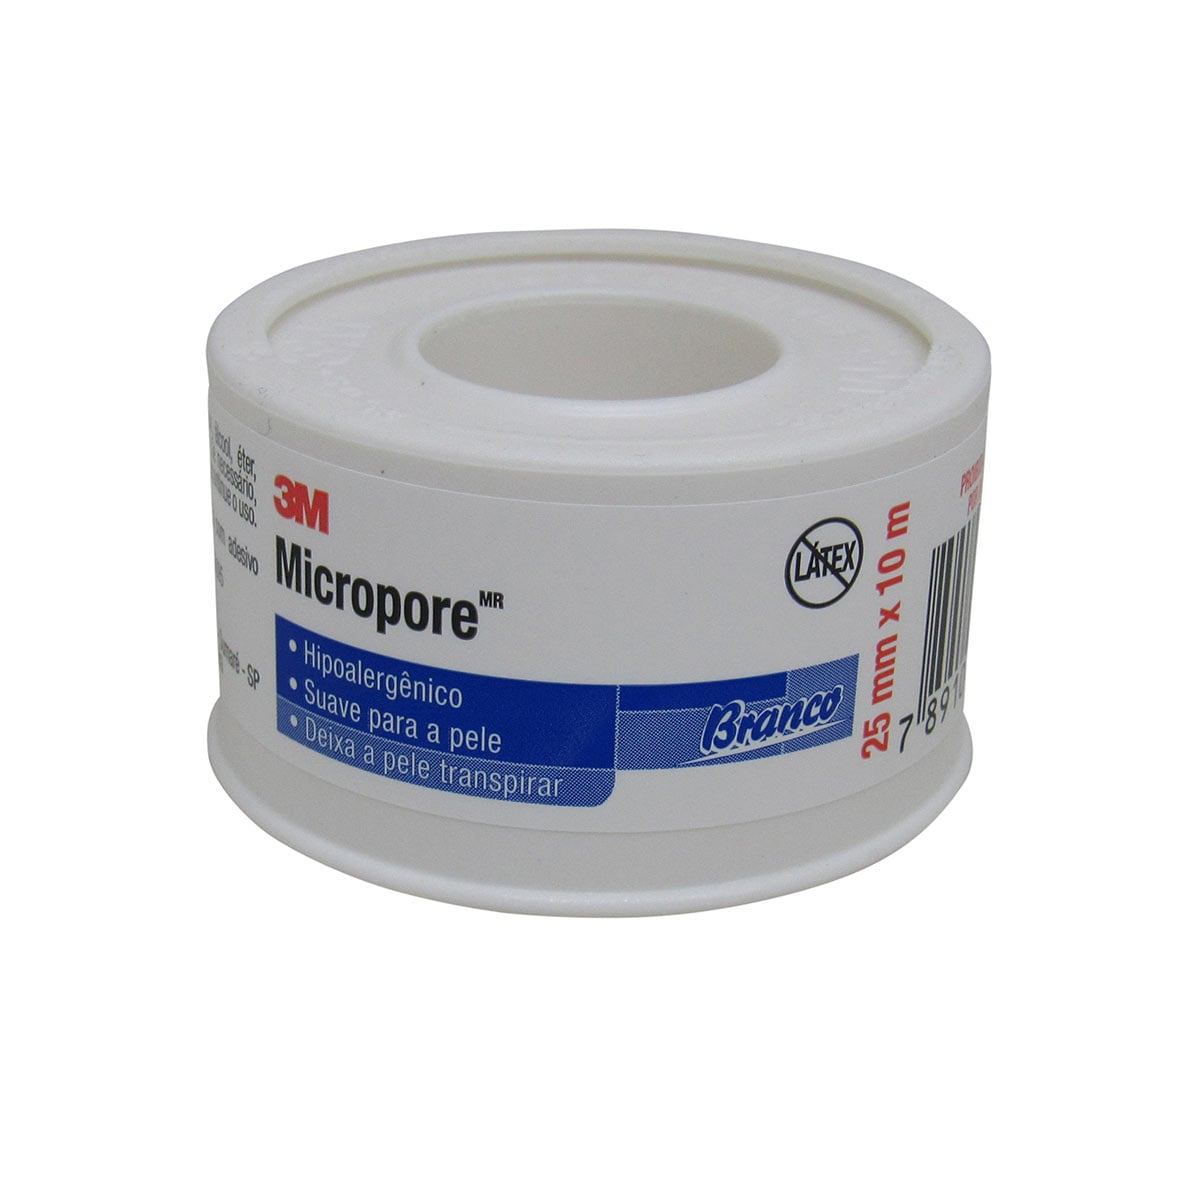 Fita Micropore 25mm x 10m Hipoalergênica Branca 3M Kit com 10un